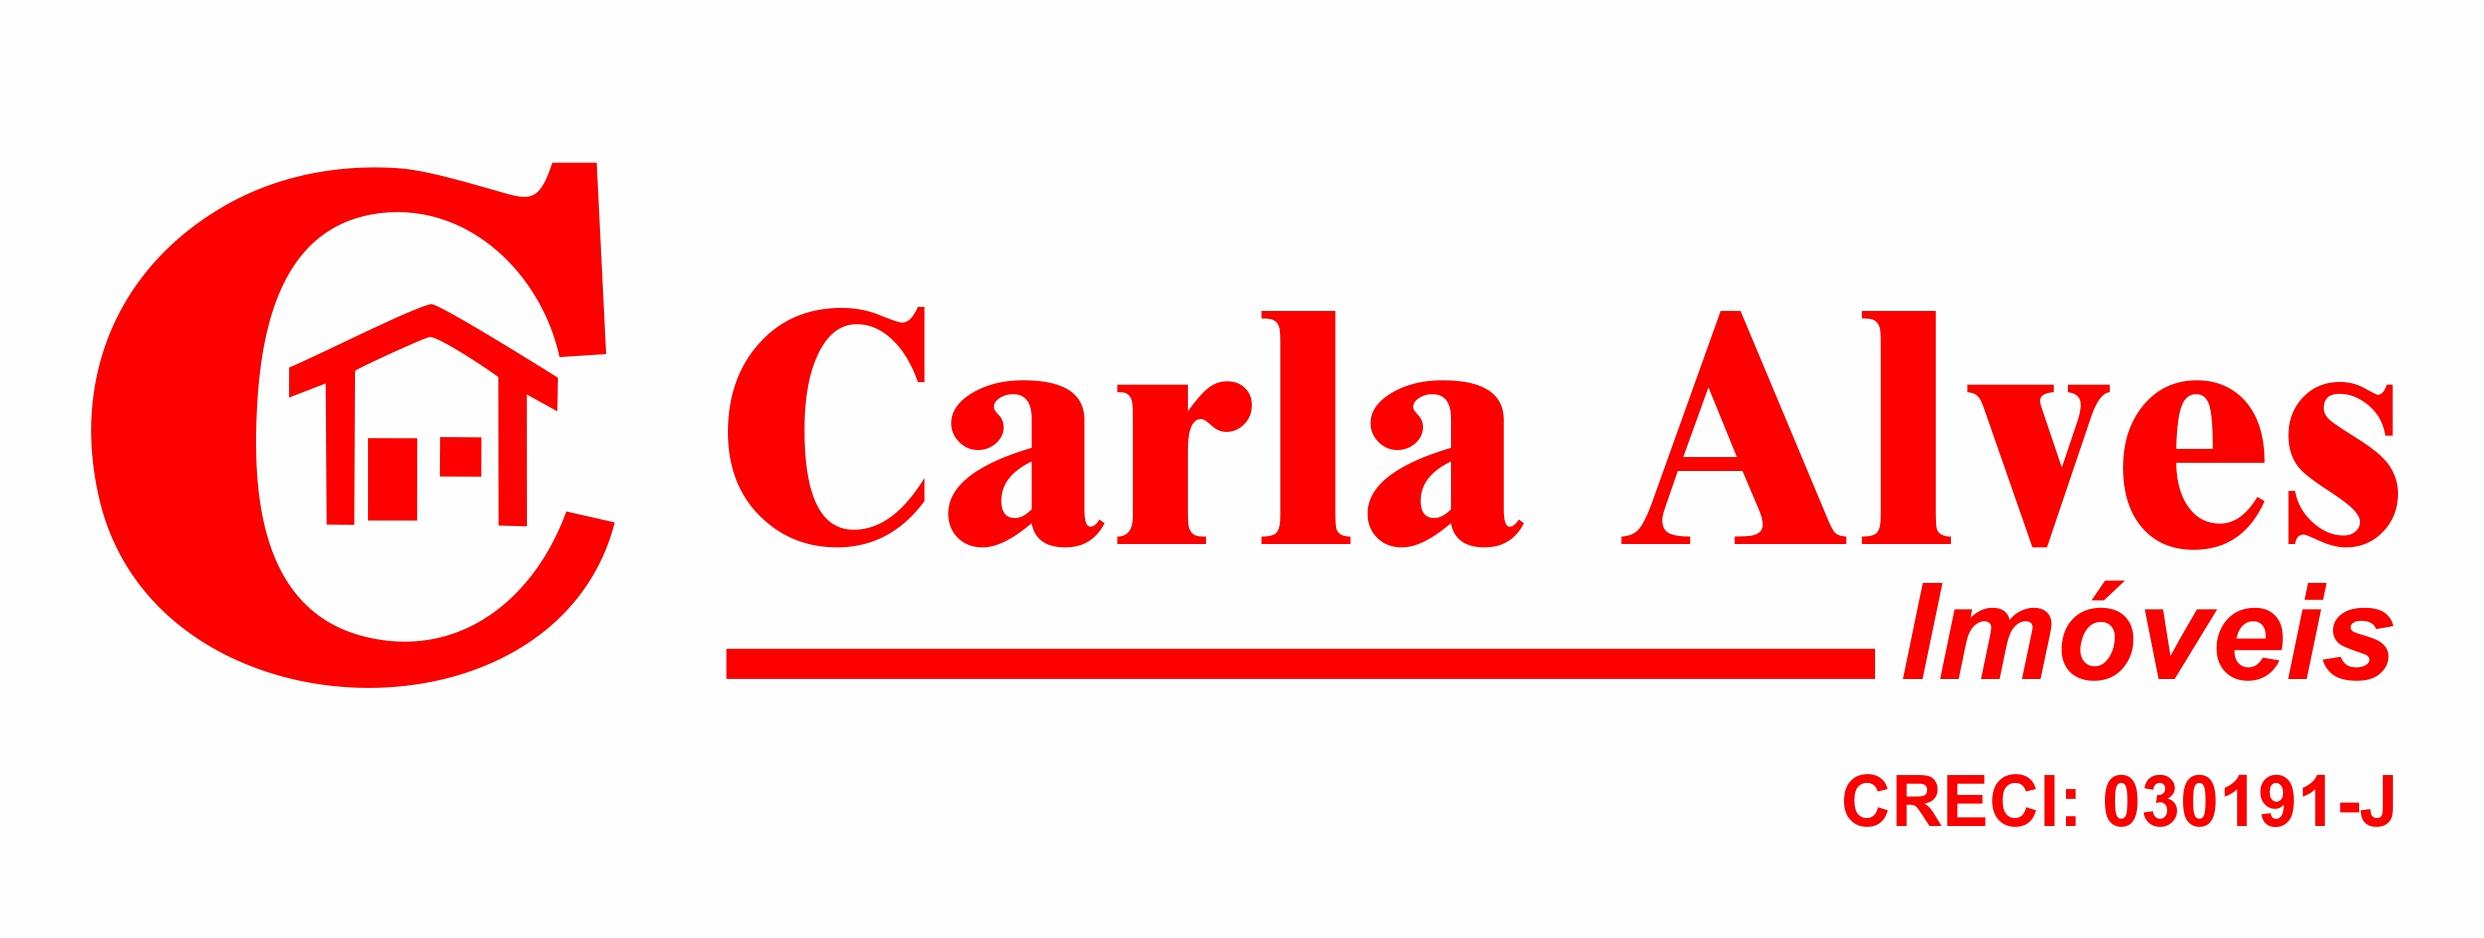 Carla Alves Imóveis